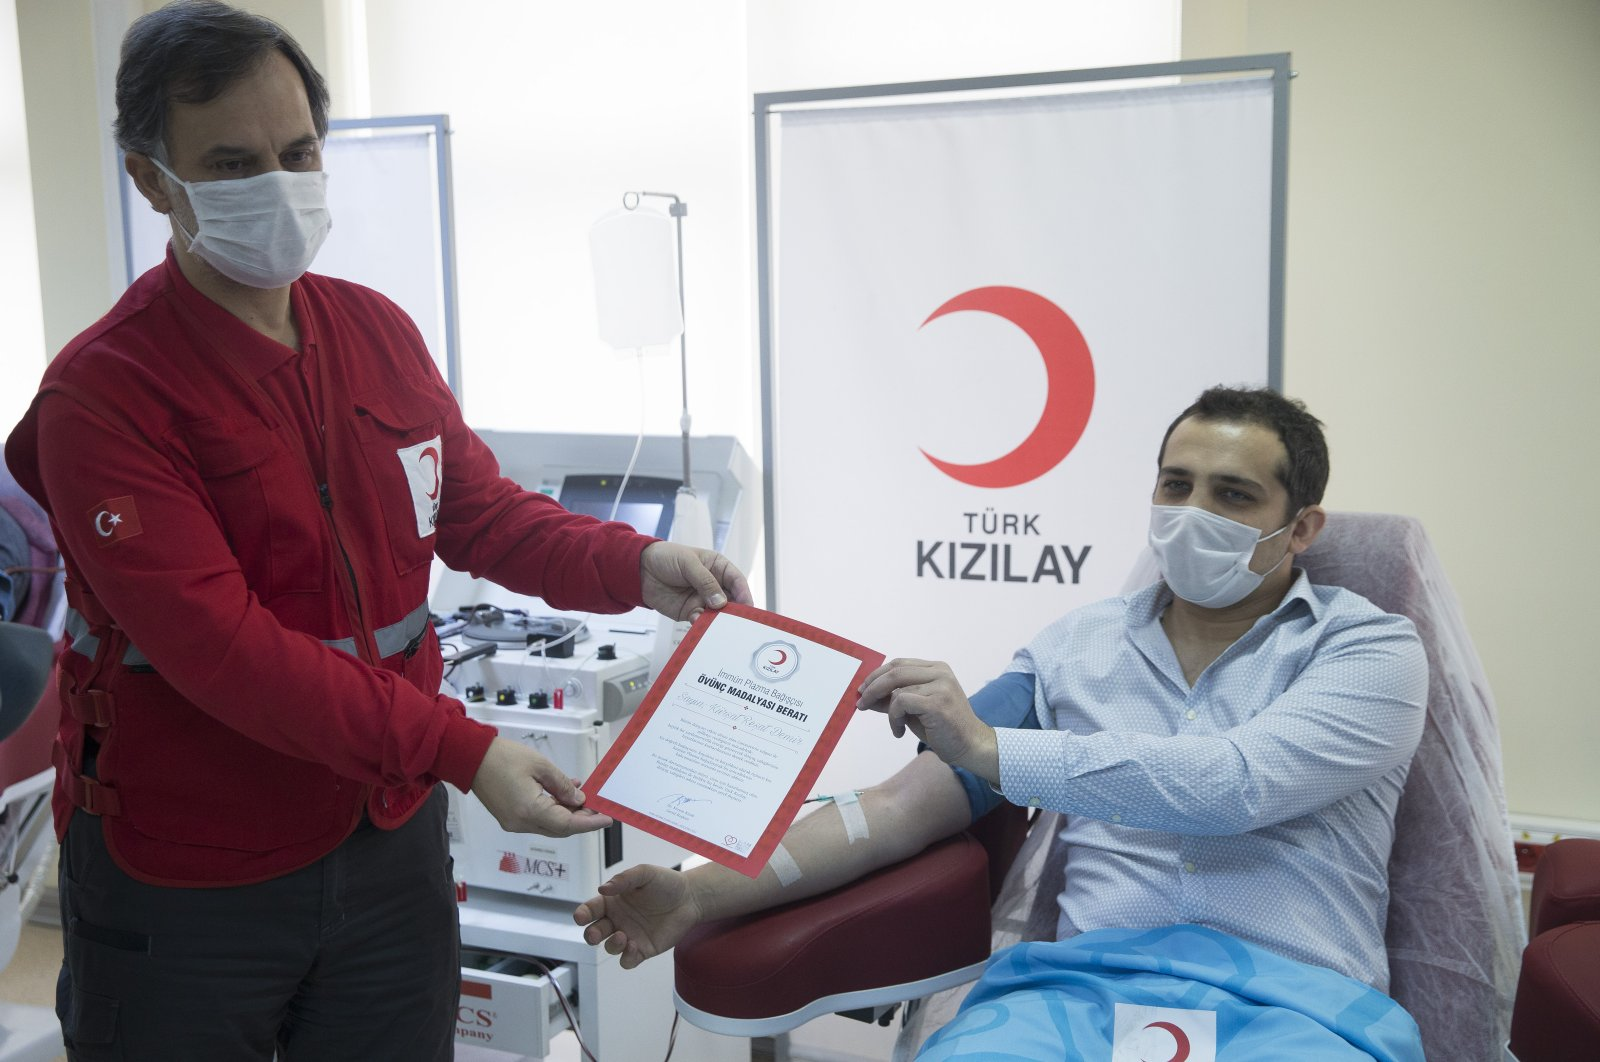 Dr. Kürşat Reşat Demir receives his medal from İbrahim Altan, general director of the Turkish Red Crescent, in Ankara, April 21, 2020. (AA Photo)